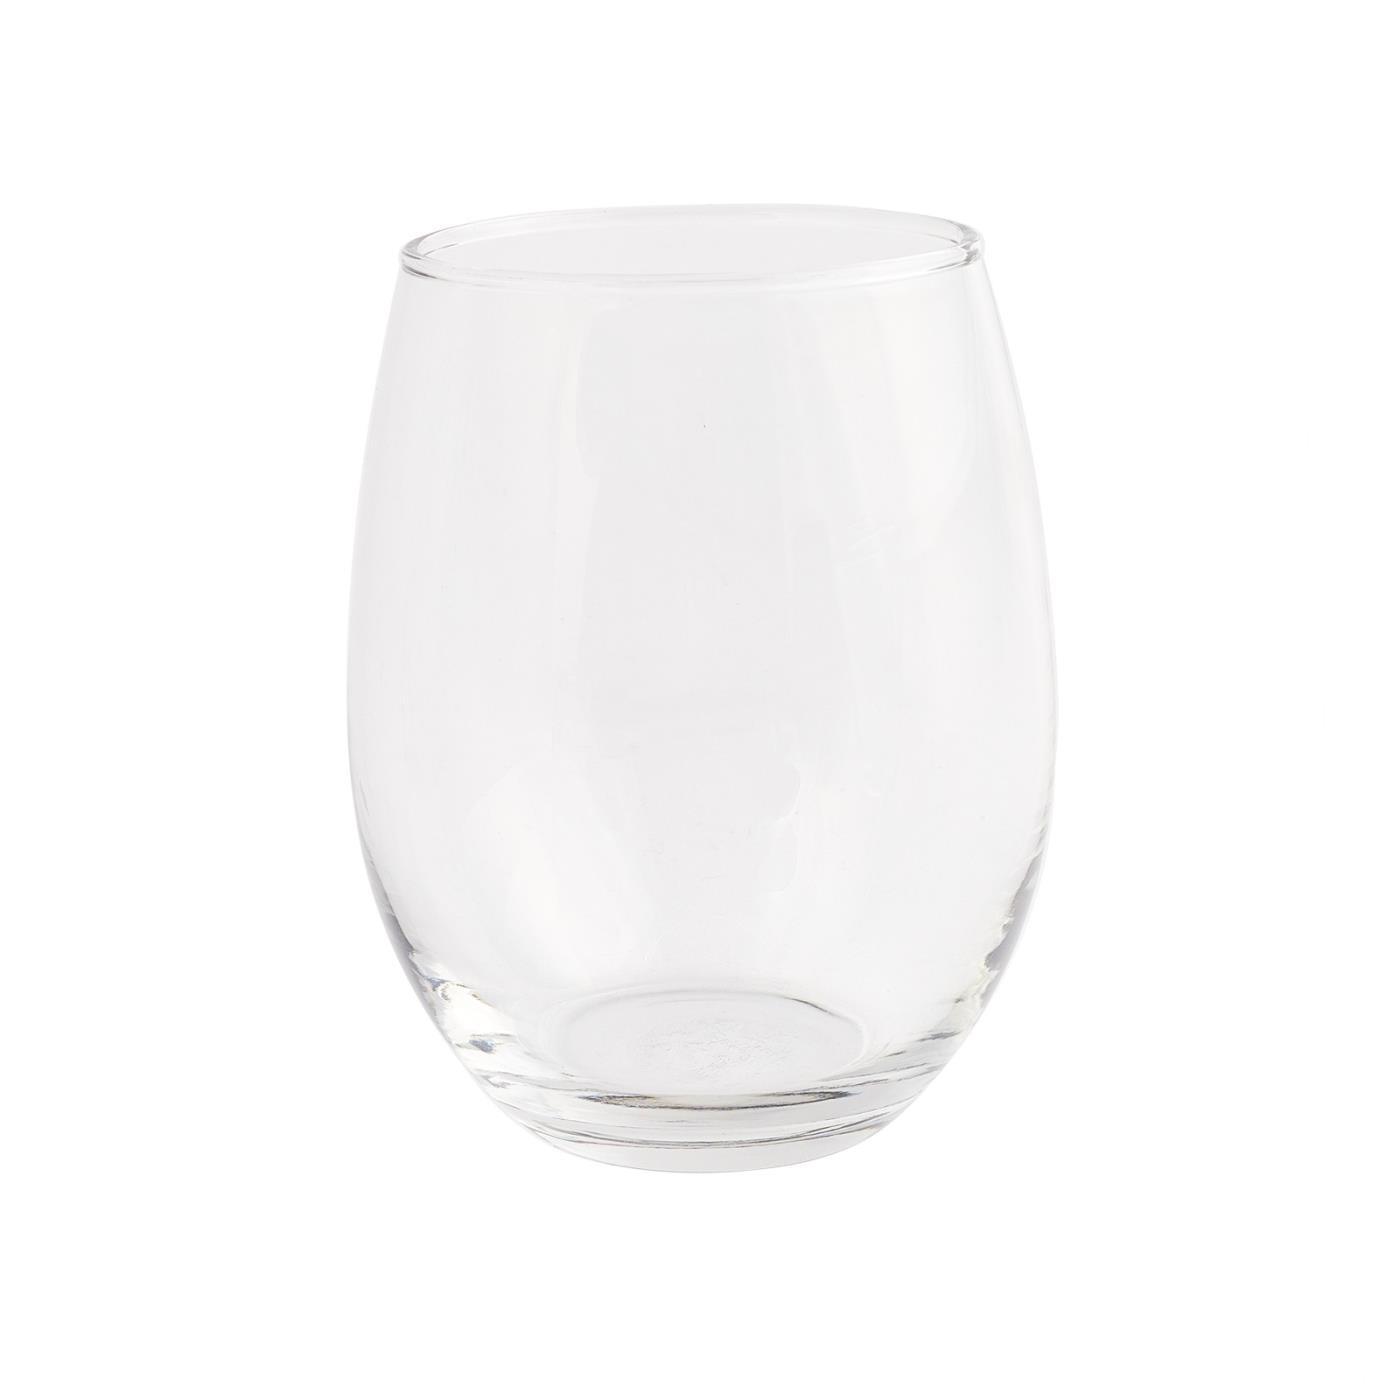 Stemless Wine Glass - 15 oz